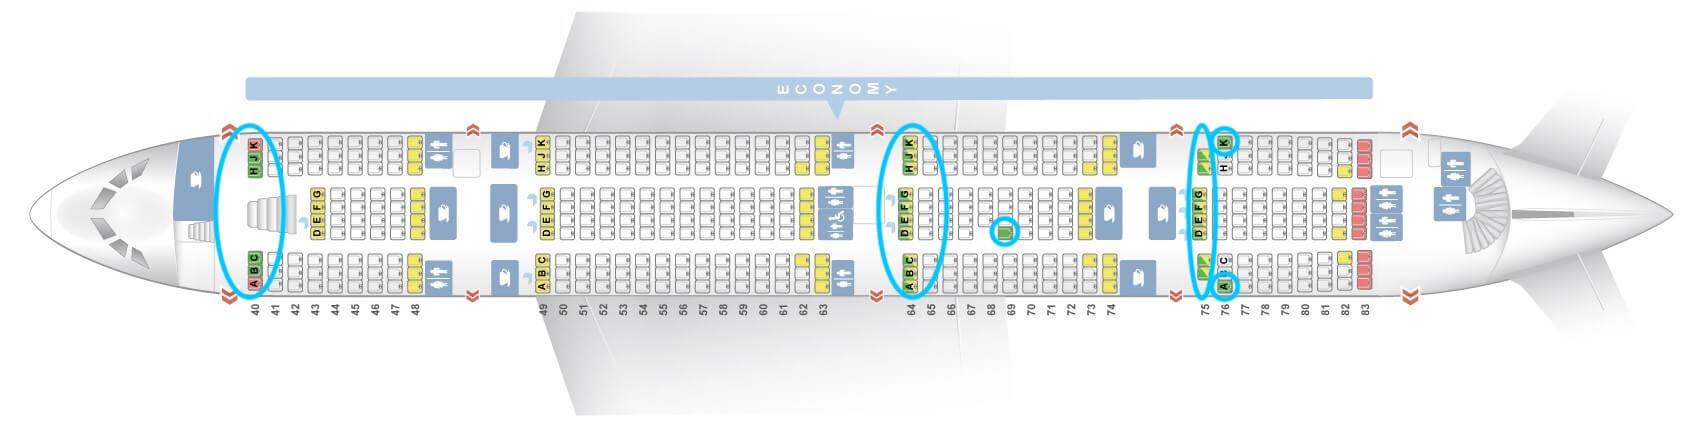 Etihad Airways Airbus A380 Economy Seat Map